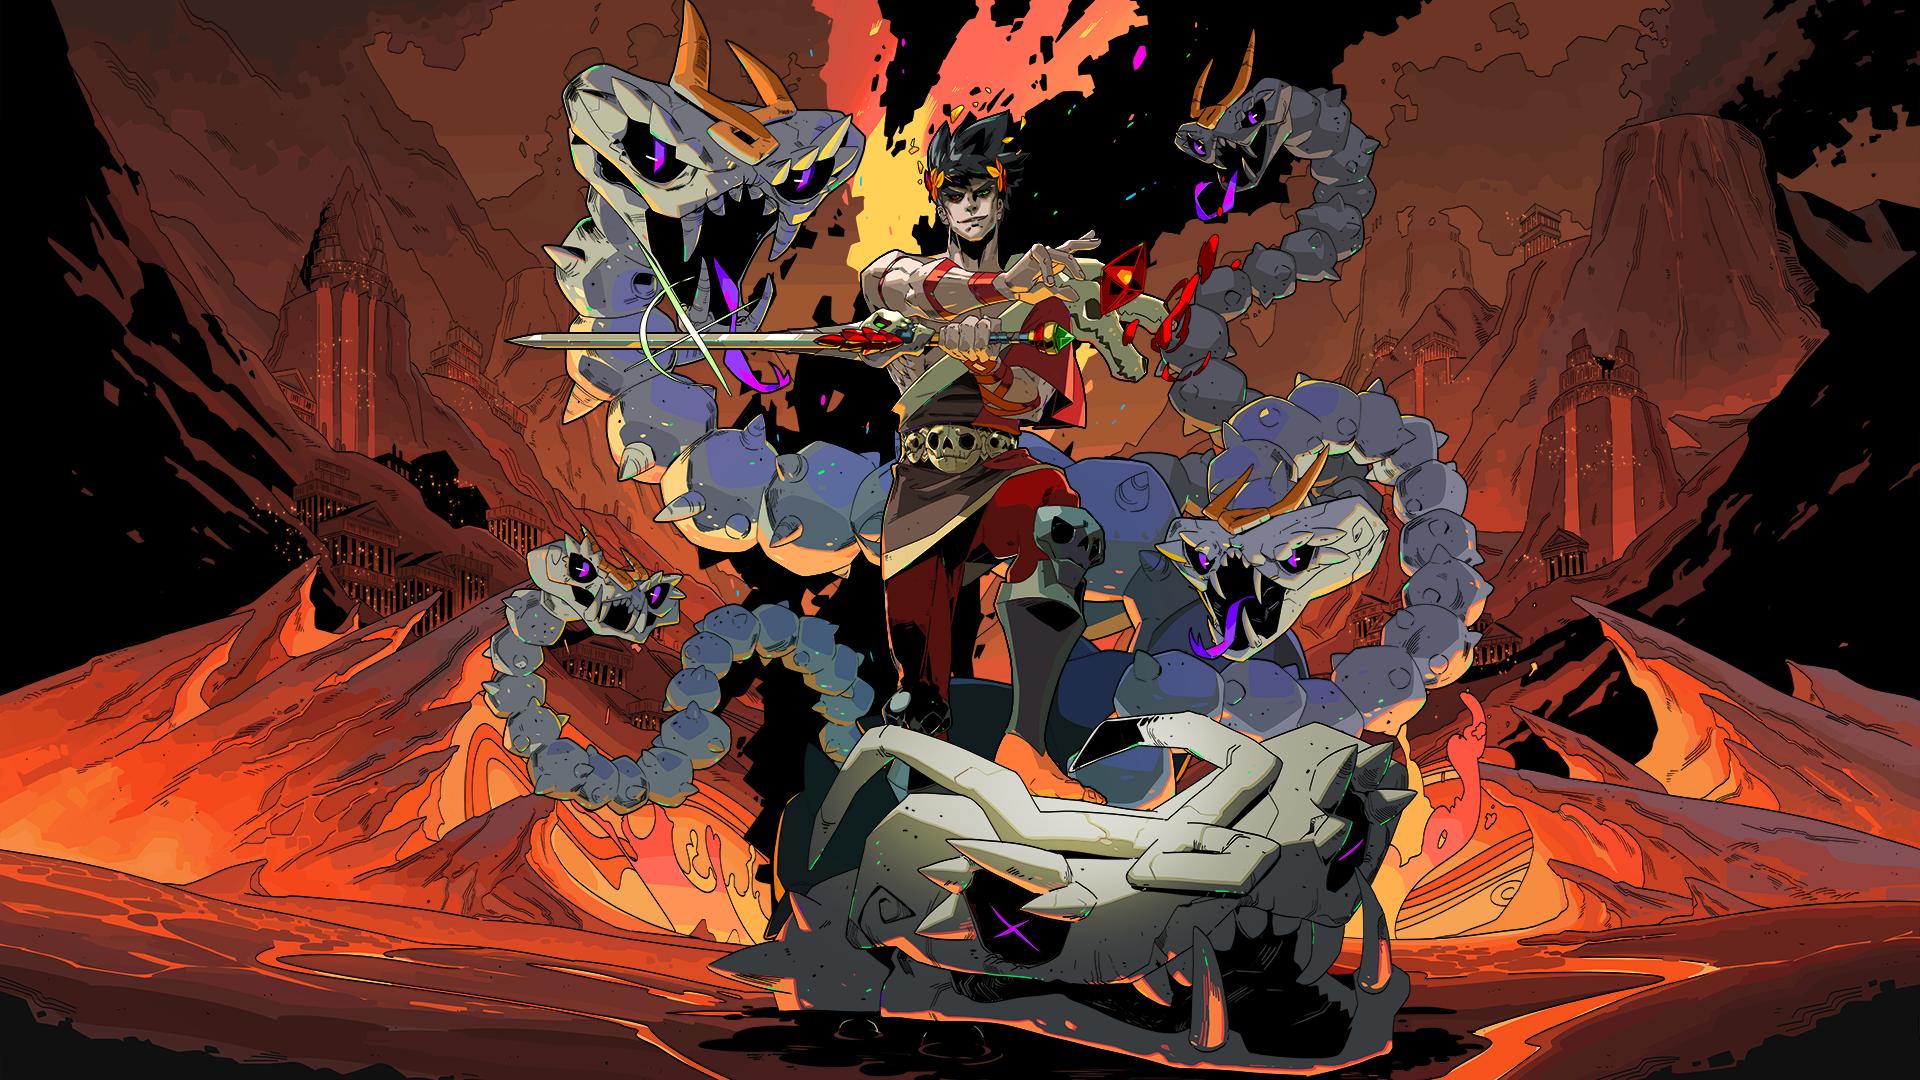 Zagreus slays the Bone Hydra in Hades